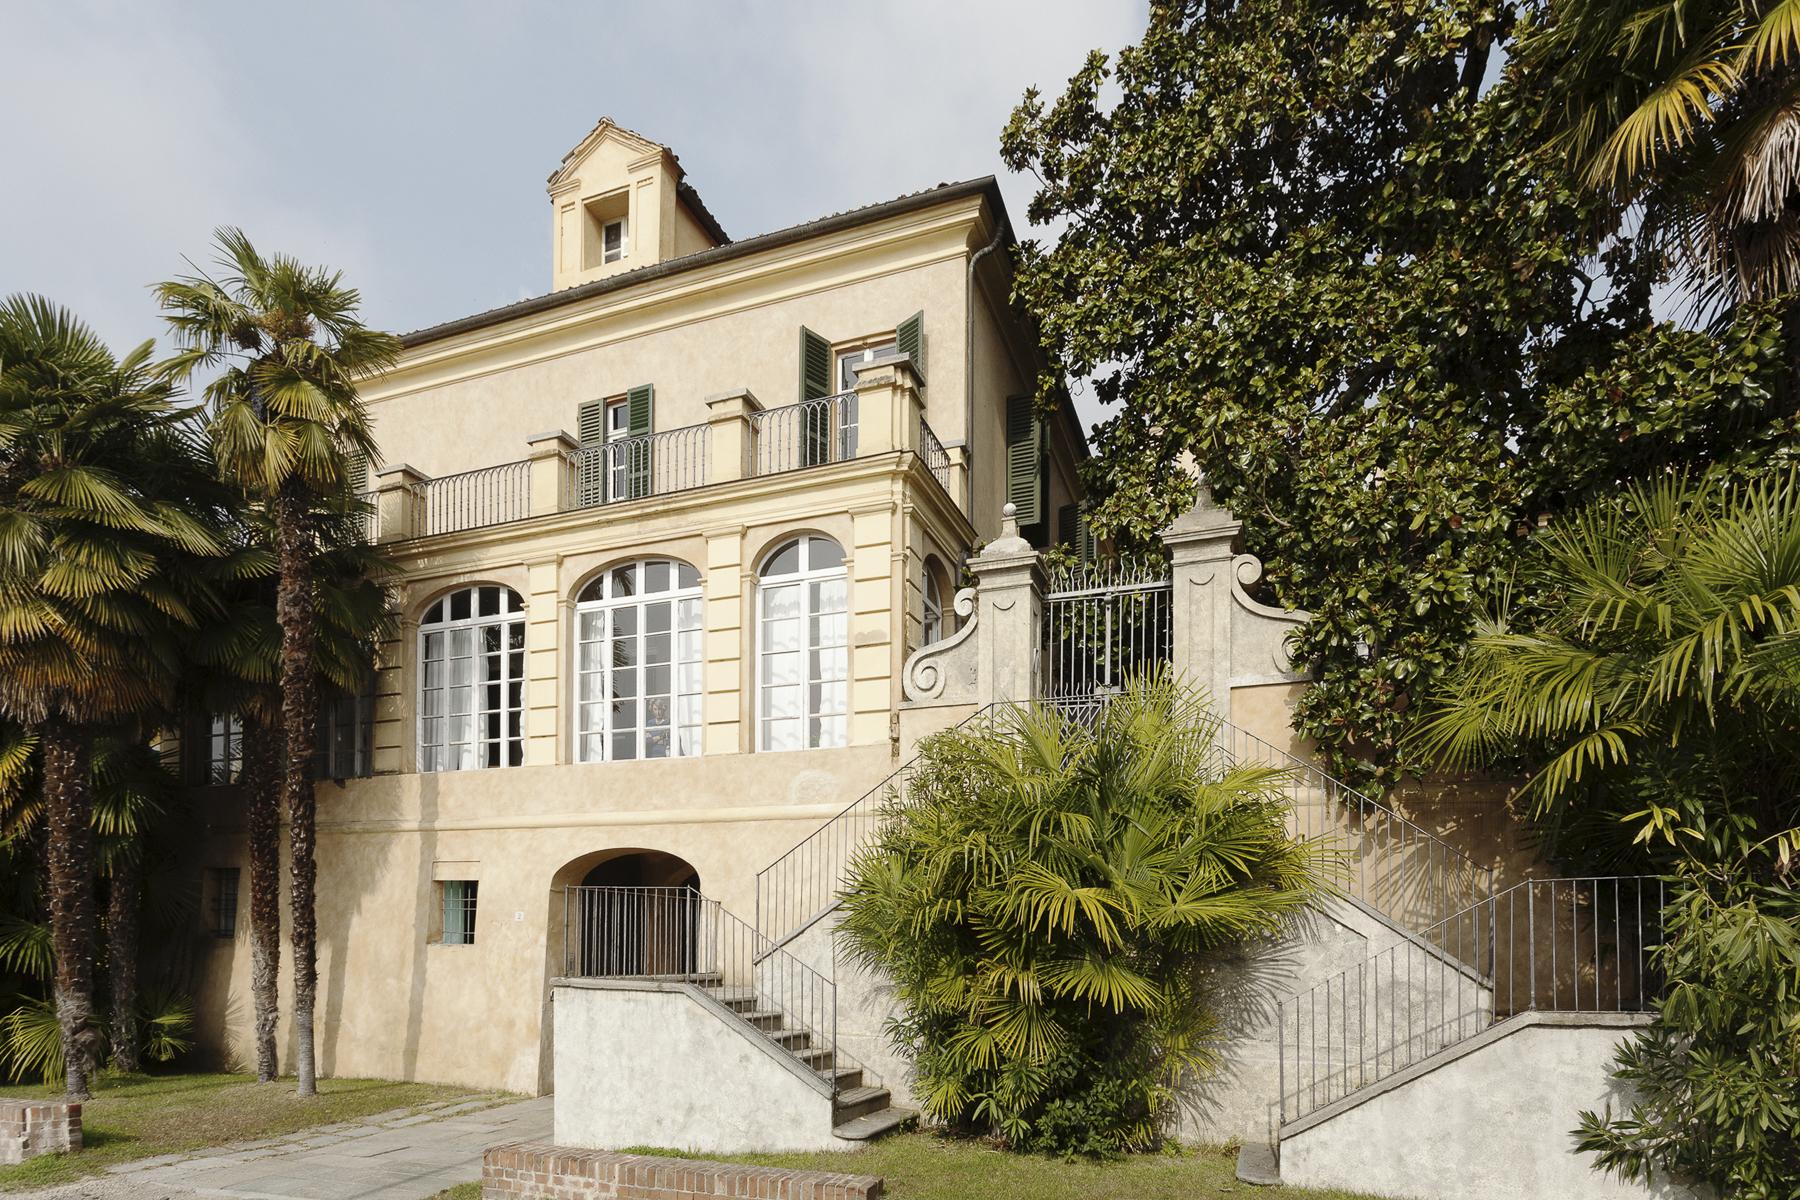 Single Family Home for Sale at A fascinating XVII century Villa in Revigliasco Hill Strada Moncalieri Other Turin, Turin 10024 Italy